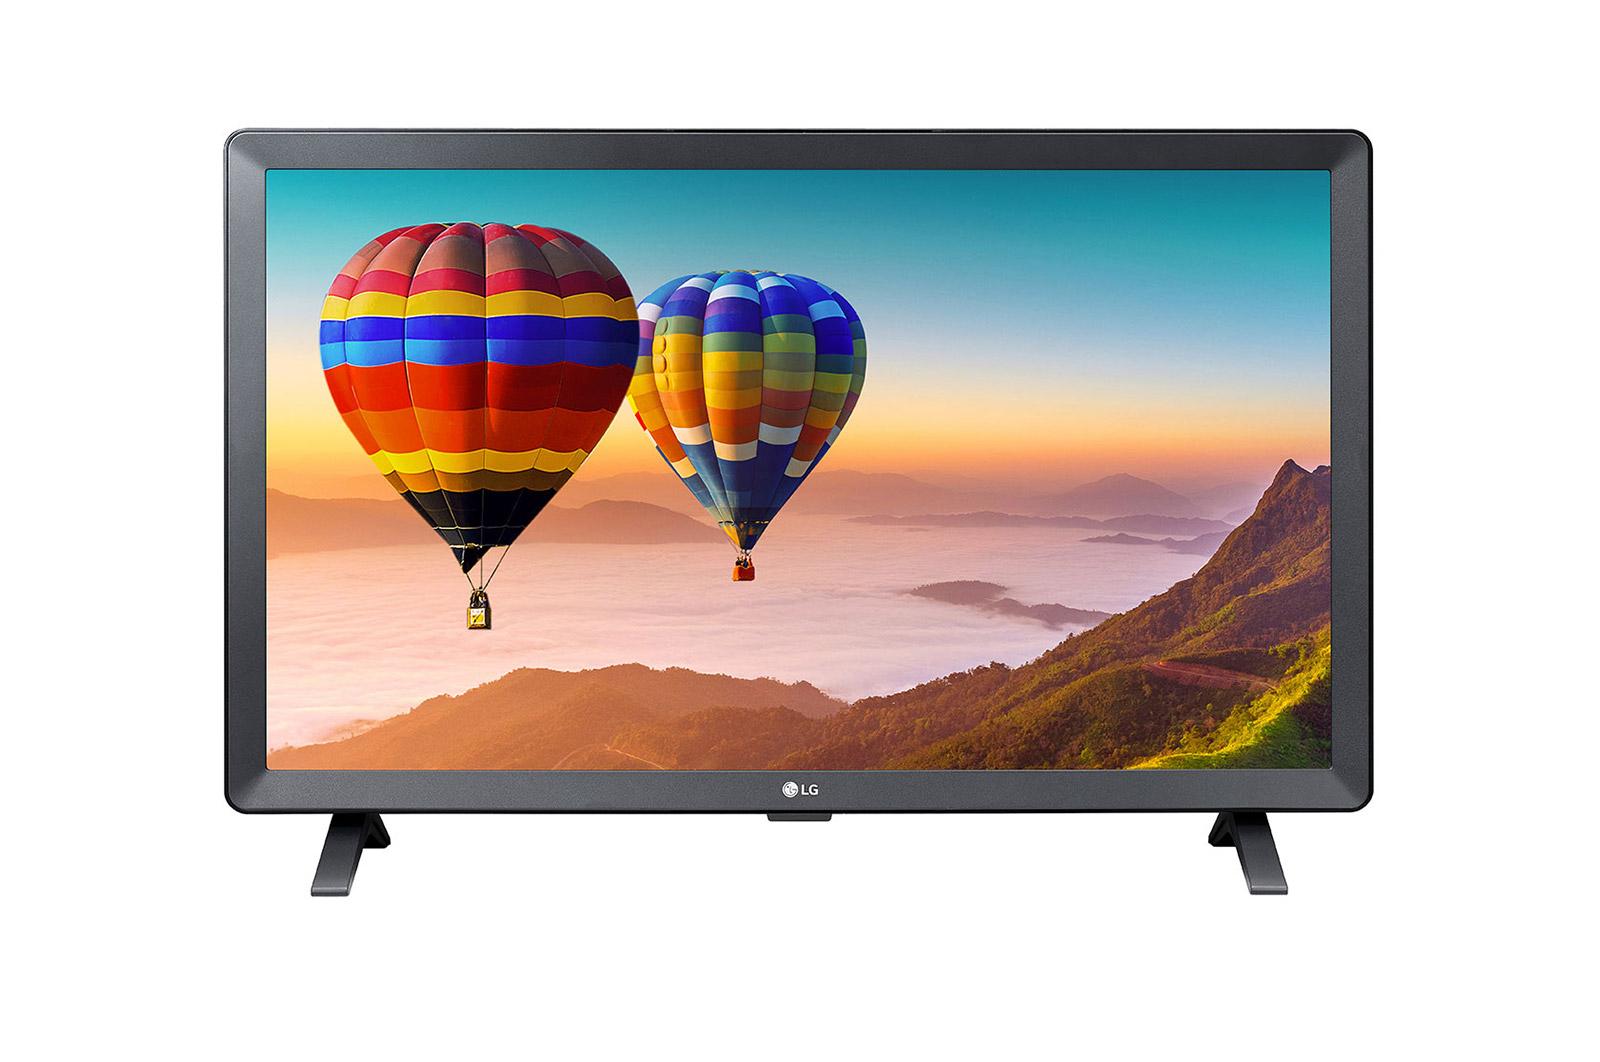 24'' LG LED 24TN520S - HD ready,DVB-T2/C/S2,smart - 24TN520S-PZ.AEU